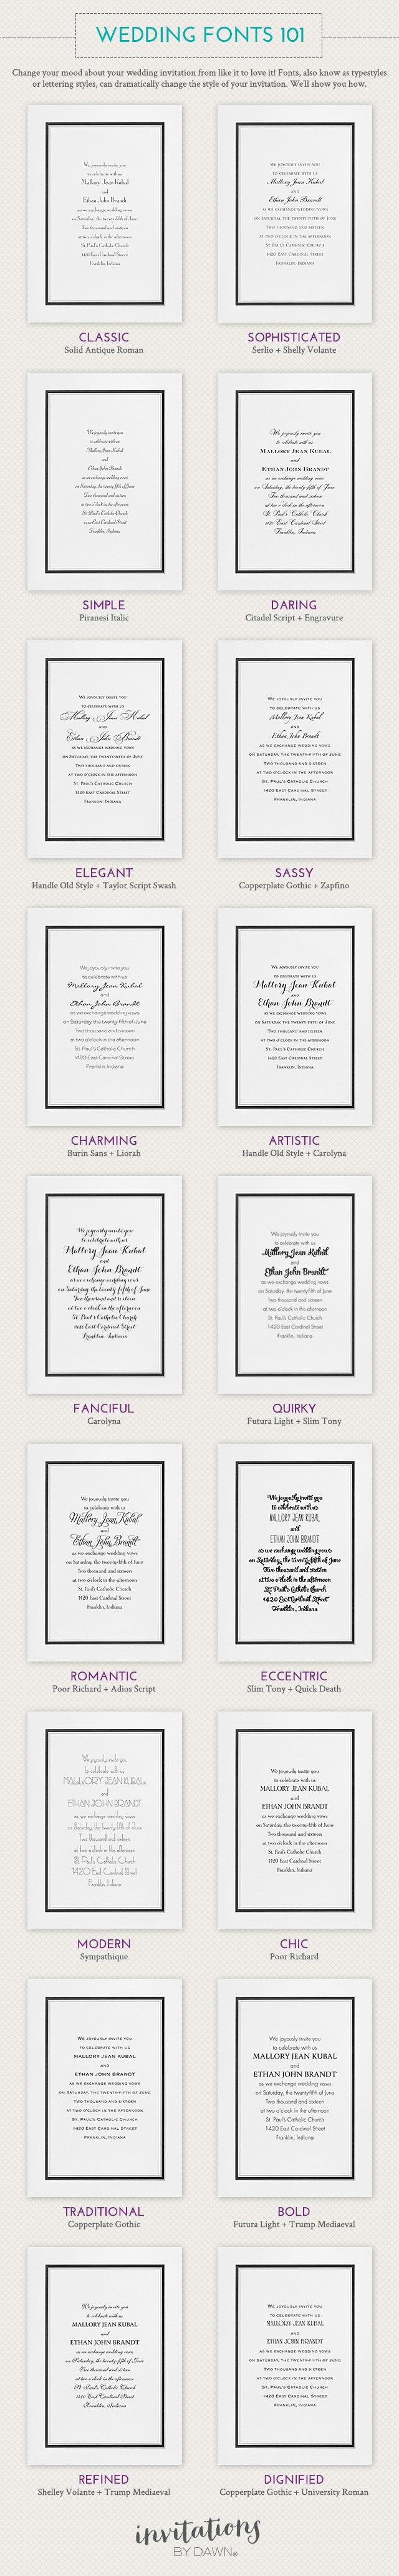 Wedding Fonts 101